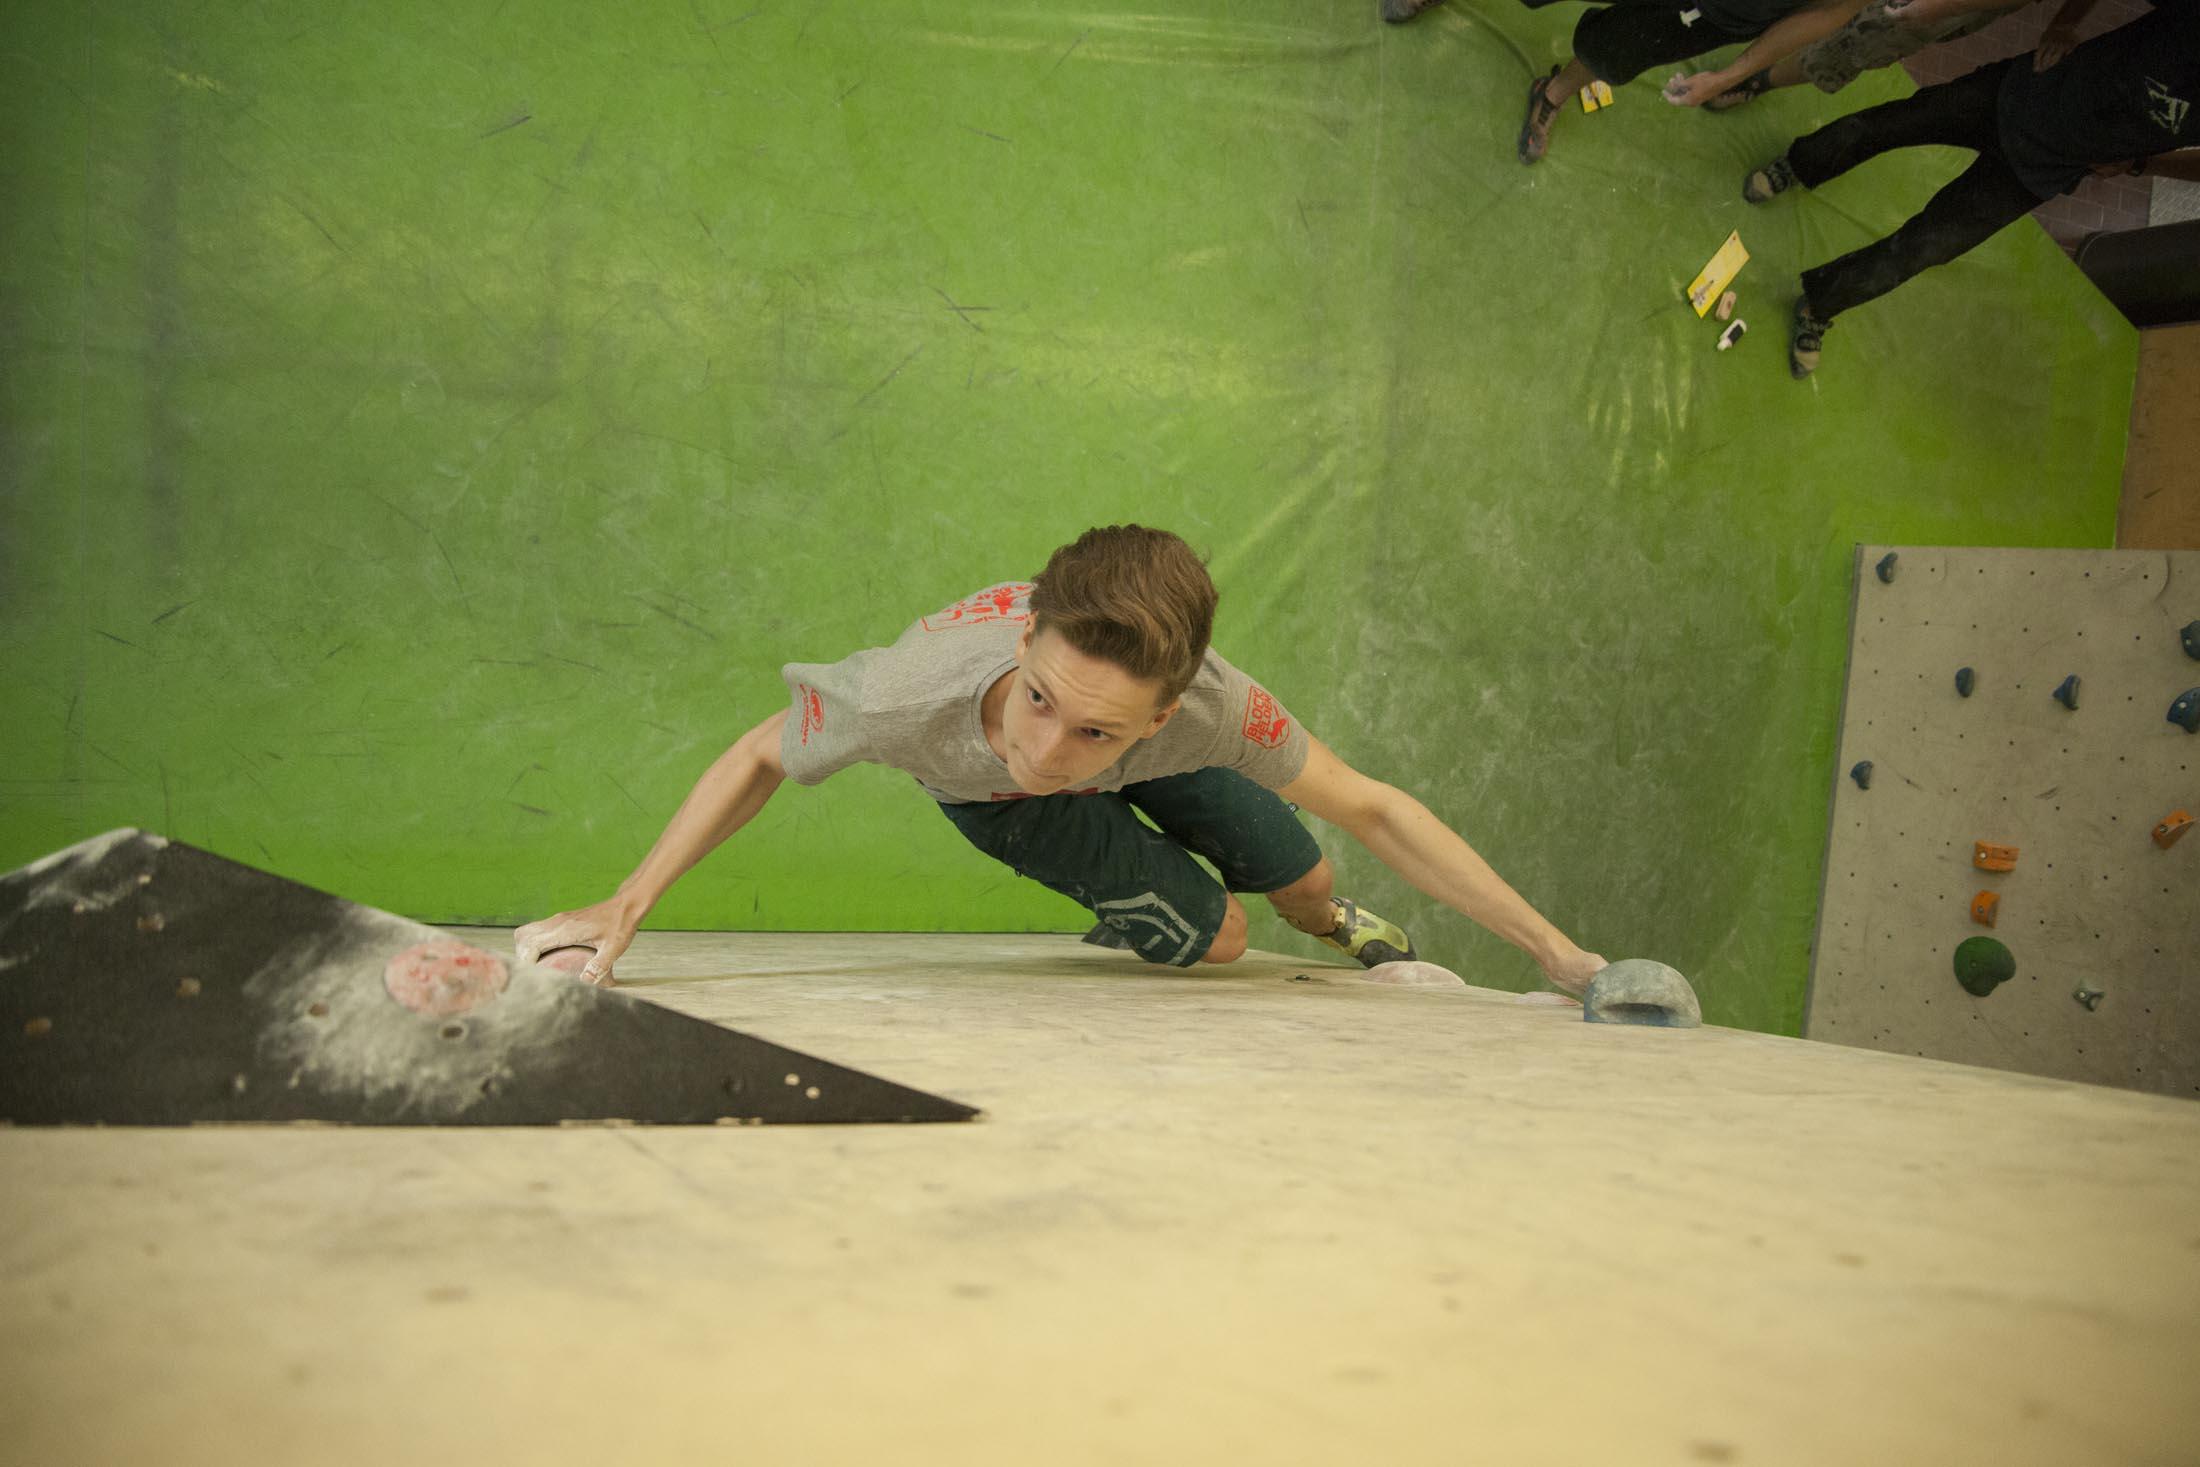 Quali, internationaler bouldercup Frankenjura 2016, BLOCKHELDEN Erlangen, Mammut, Bergfreunde.de, Boulderwettkampf07092016299